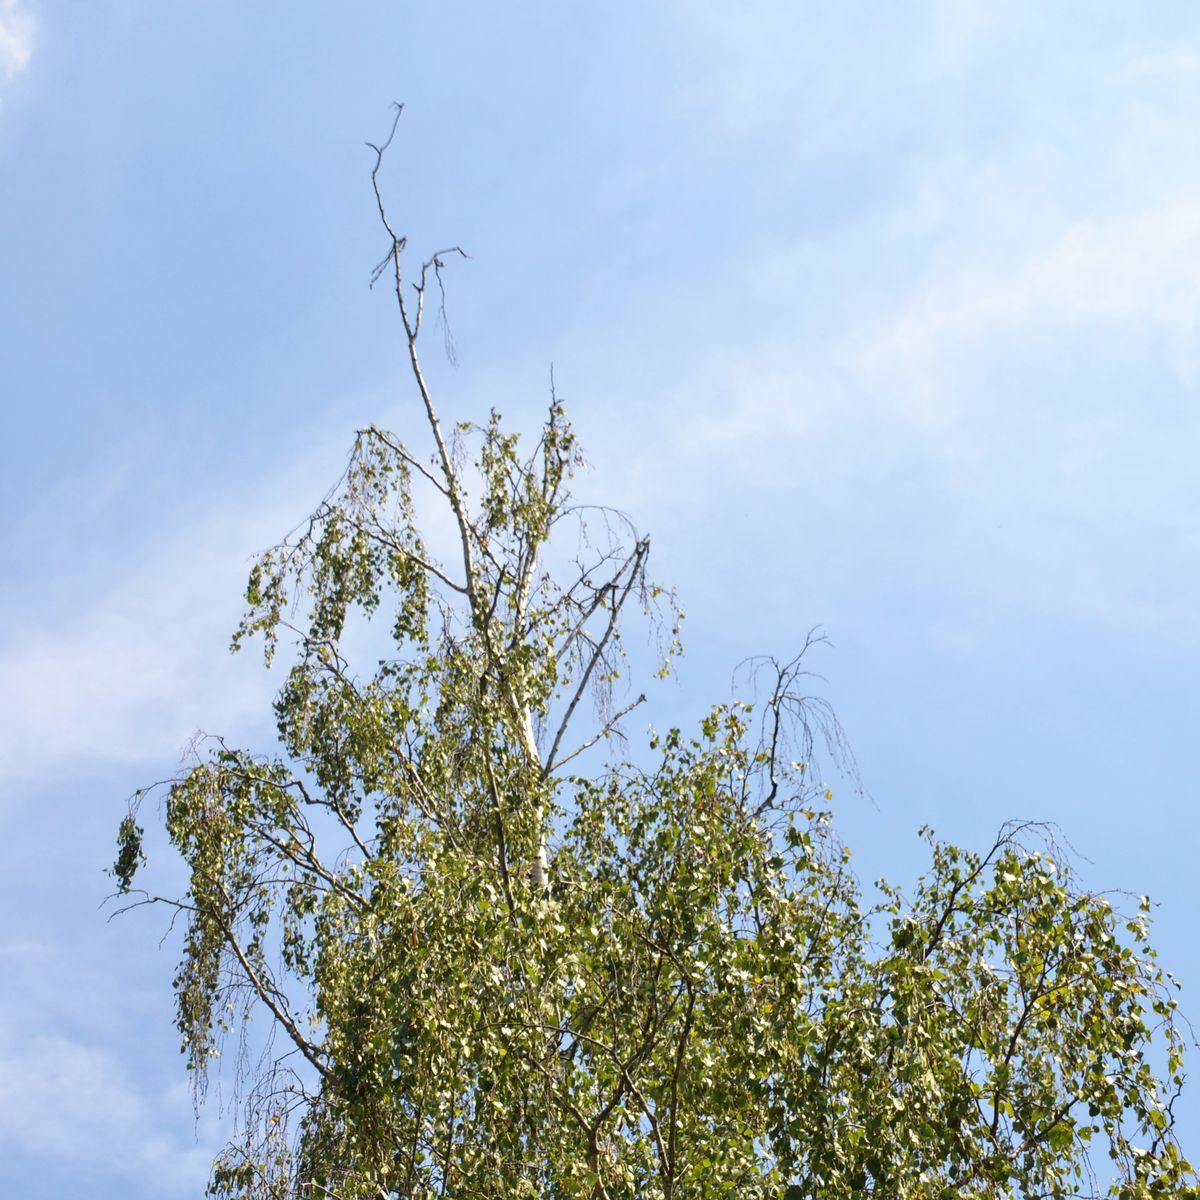 Klimawandel im Blick - Das Birkensterben